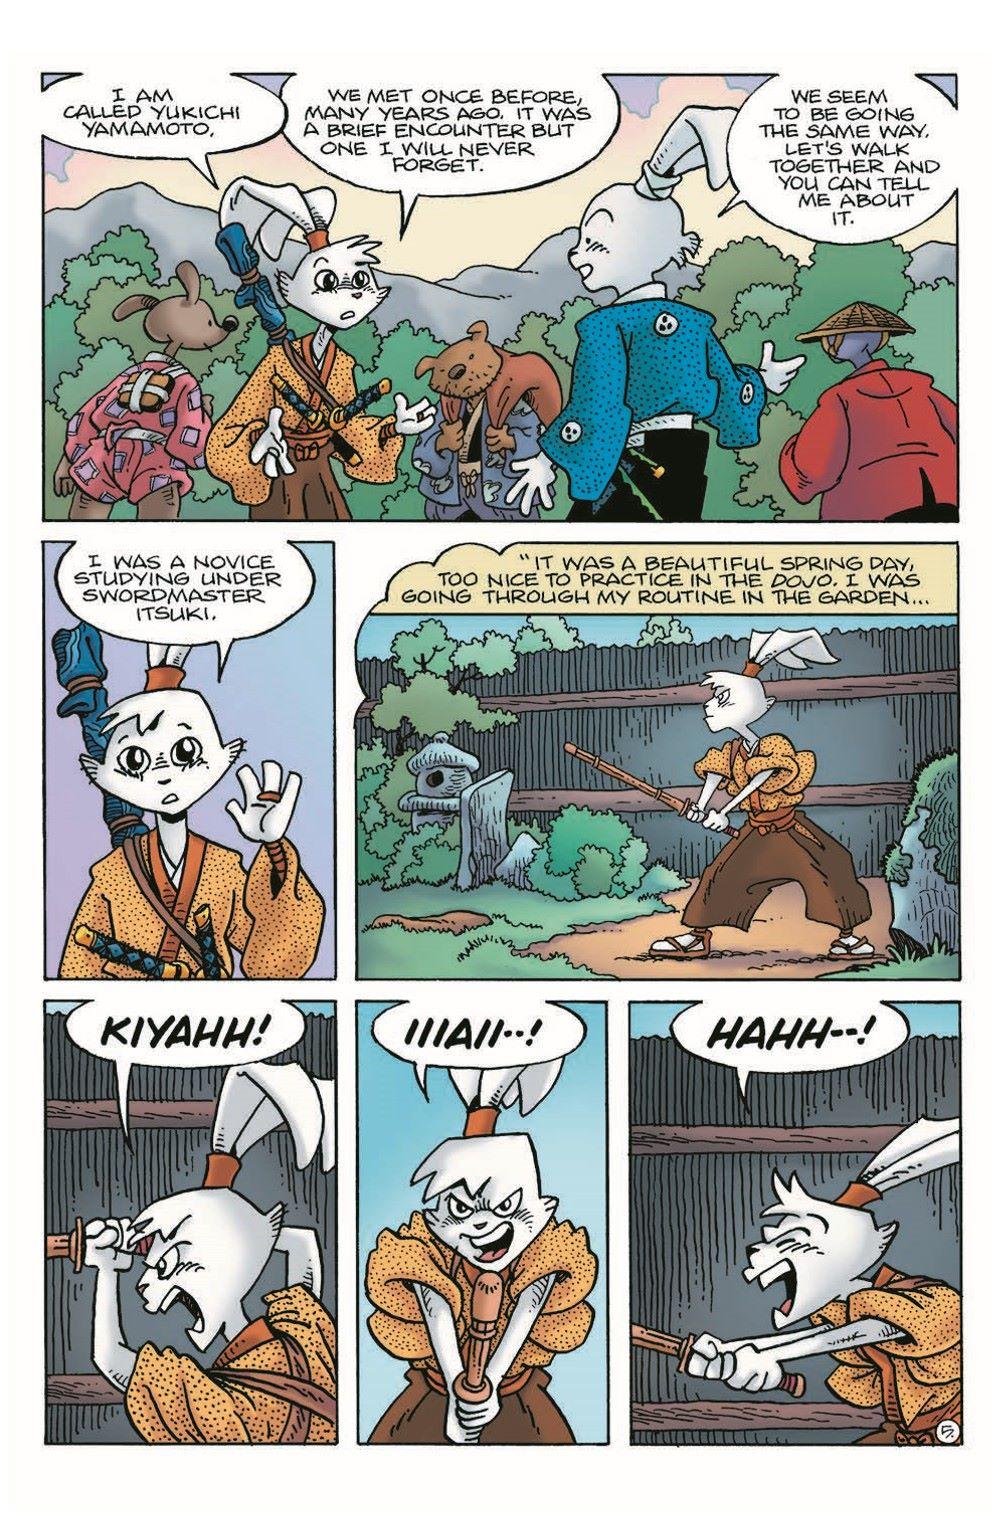 Usagi20_pr-7 ComicList Previews: USAGI YOJIMBO #20